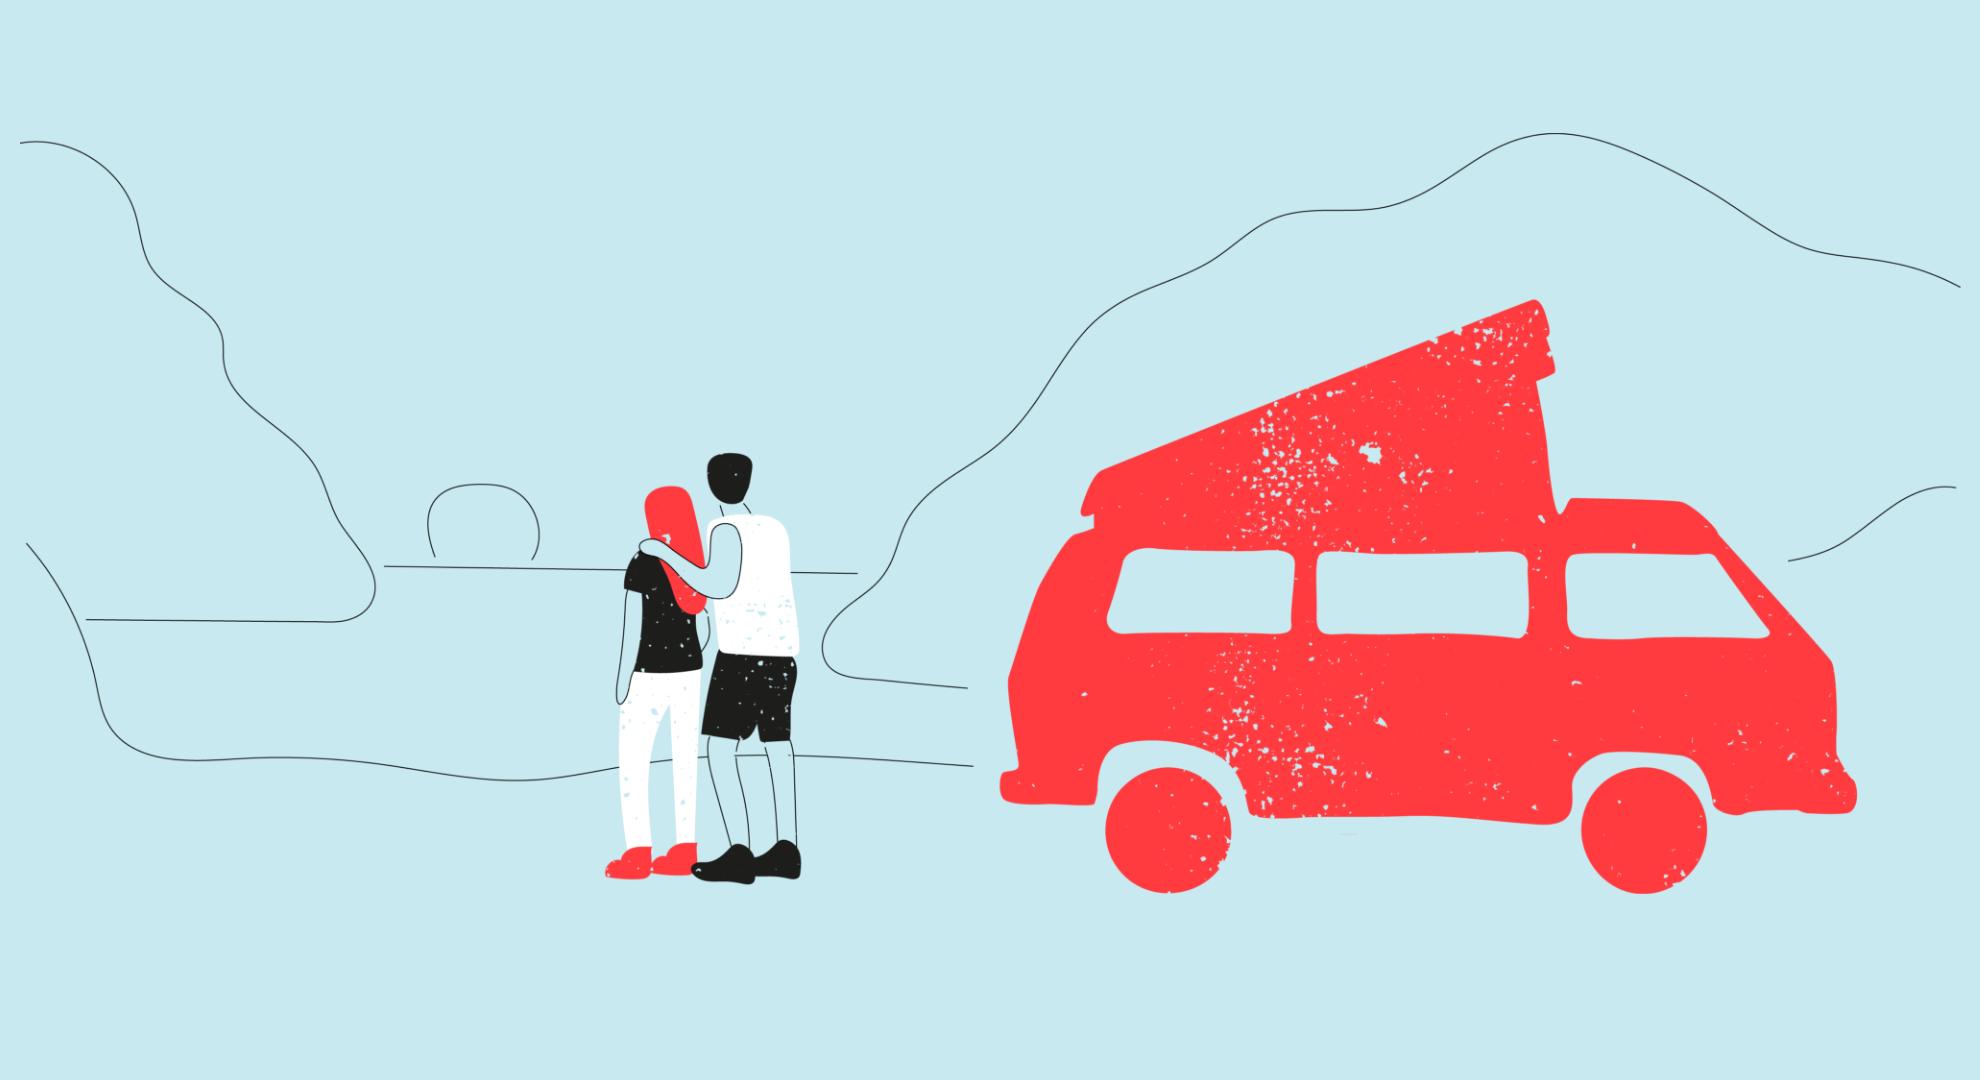 Illustration for best UK holidays